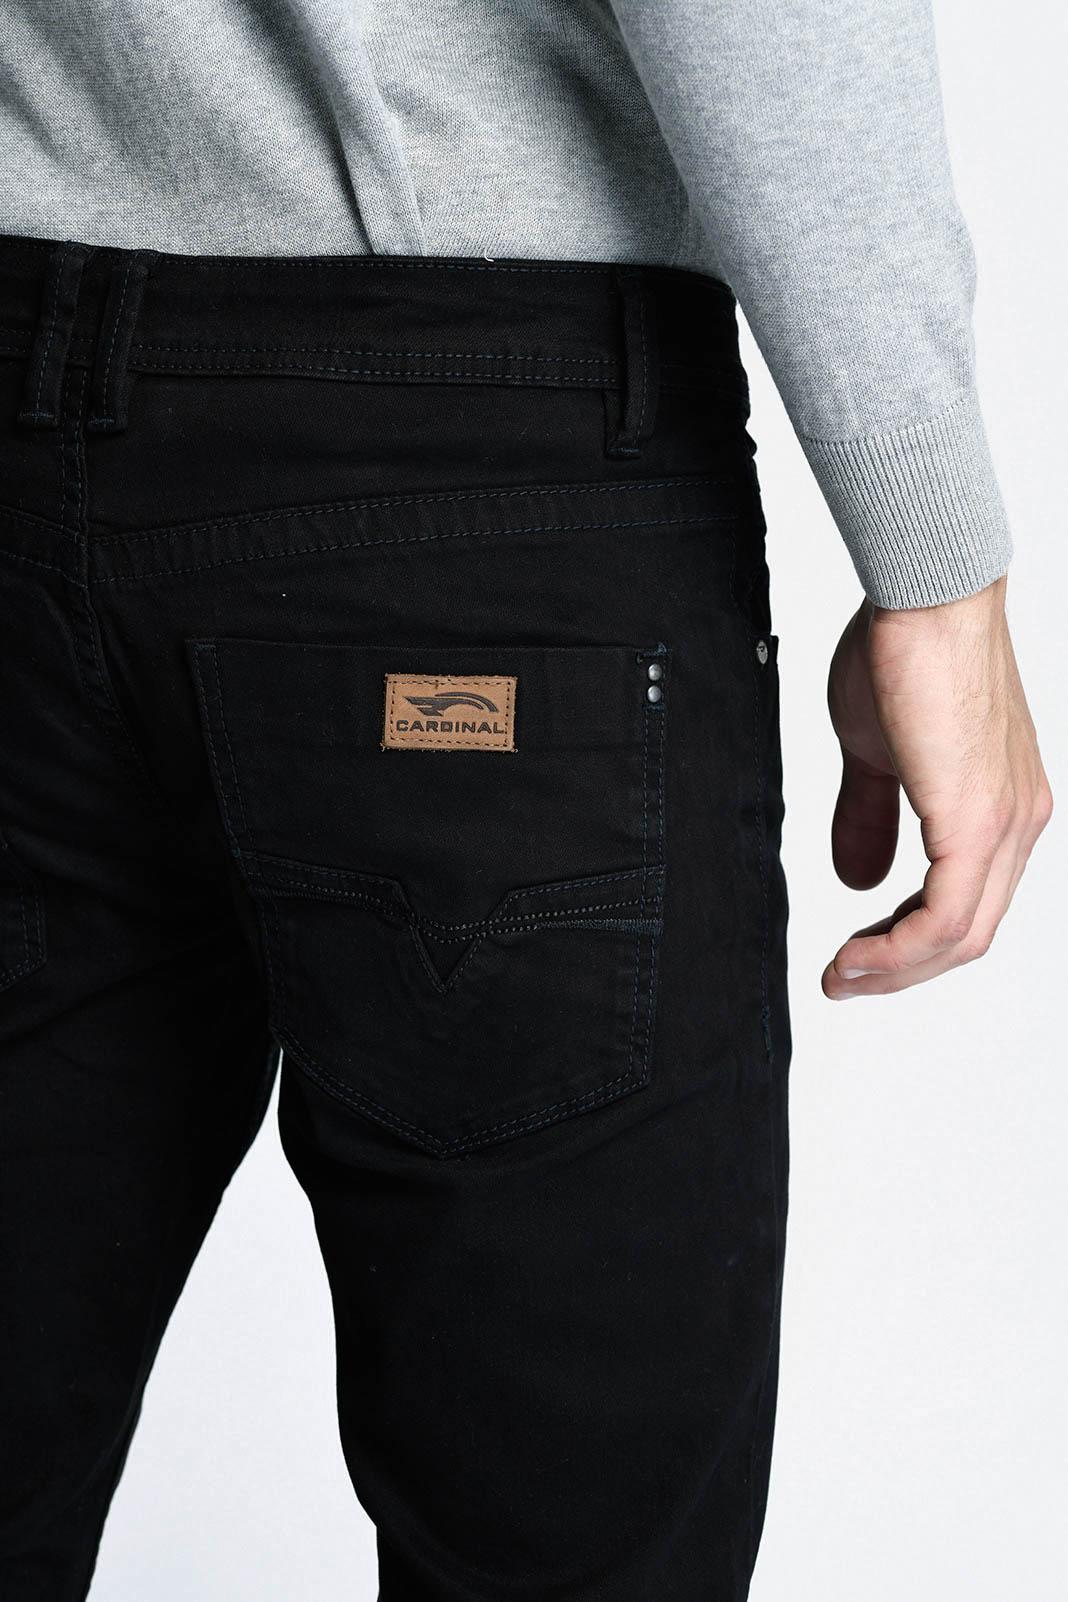 98+  Celana Jeans Cardinal Warna Hitam Terbaik Gratis